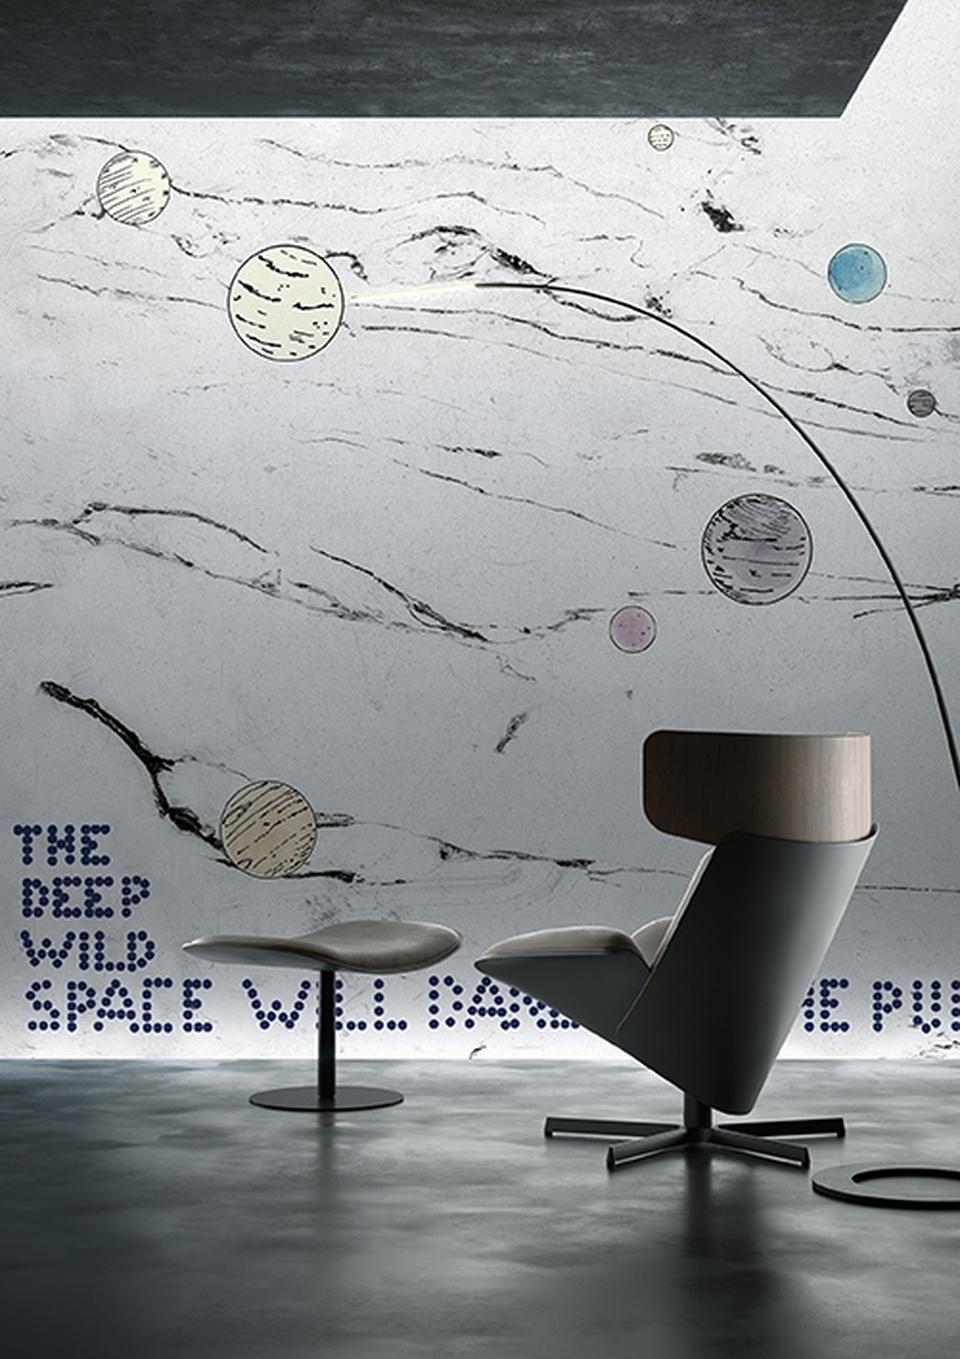 THE DEEP WILD SPACE